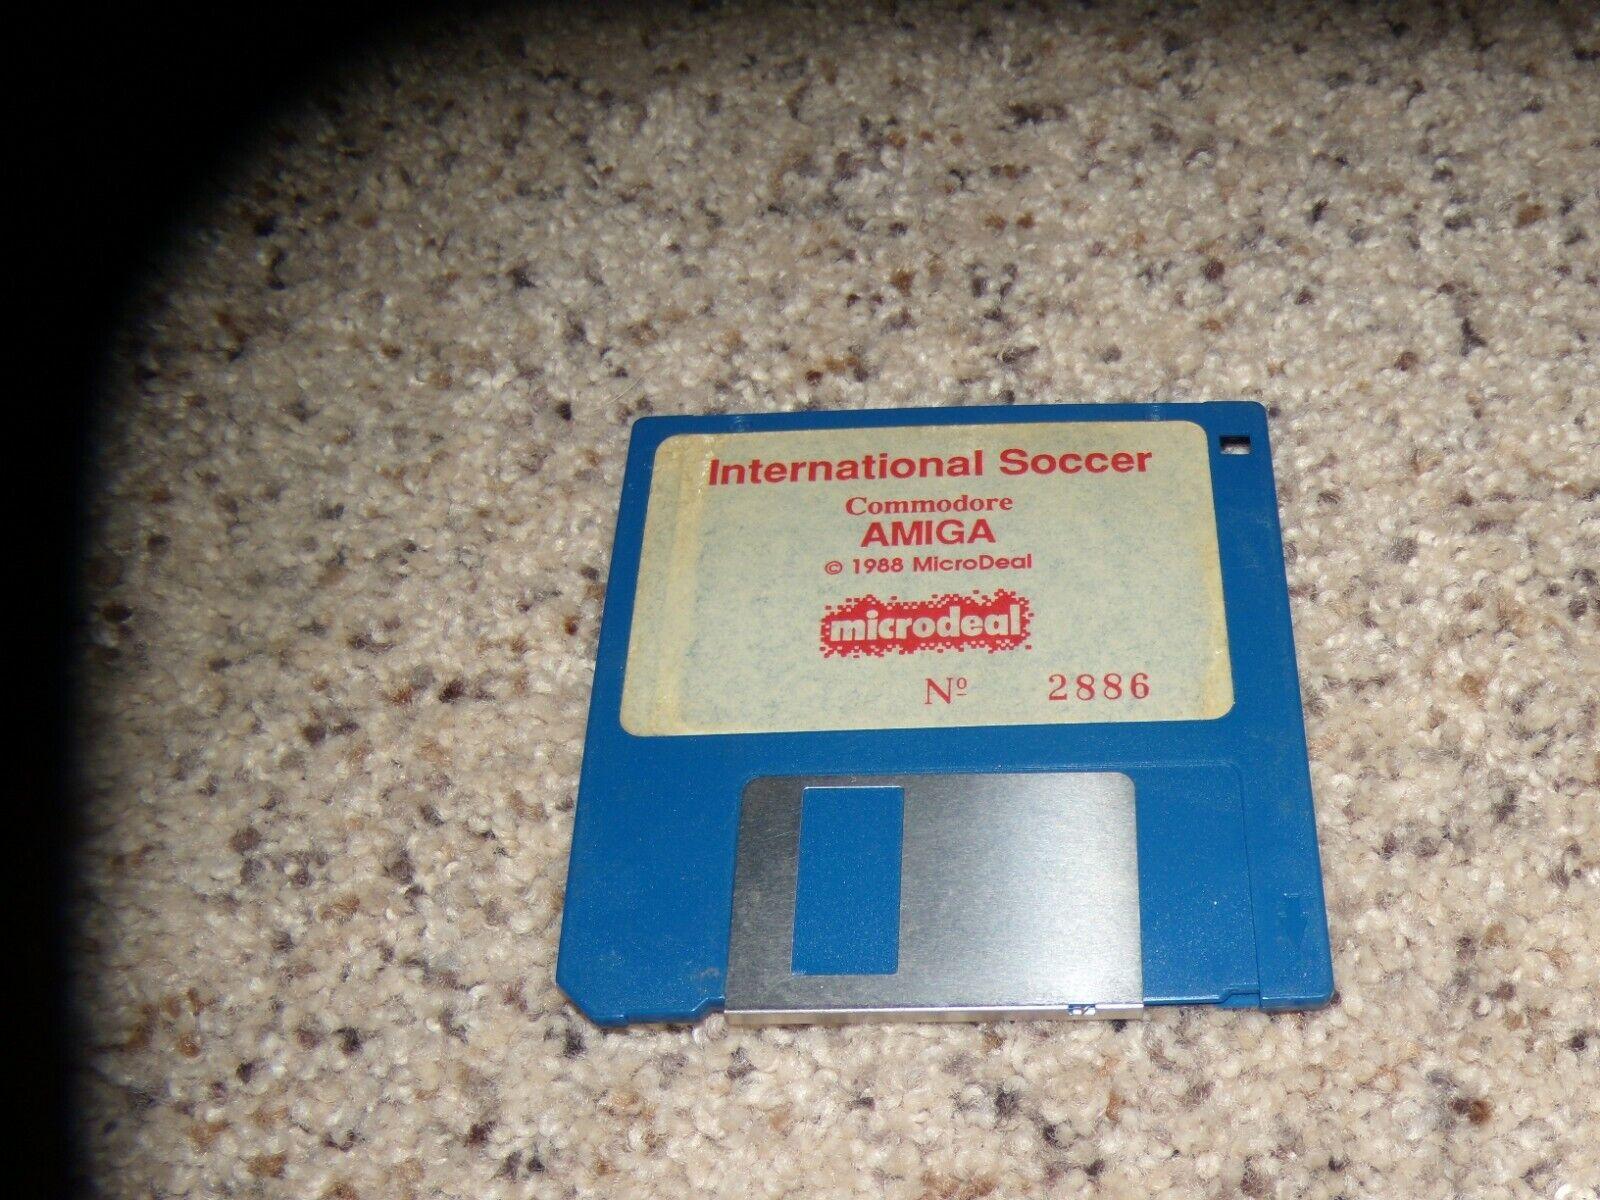 International Soccer Commodore Amiga 3.5 Disk - $8.99